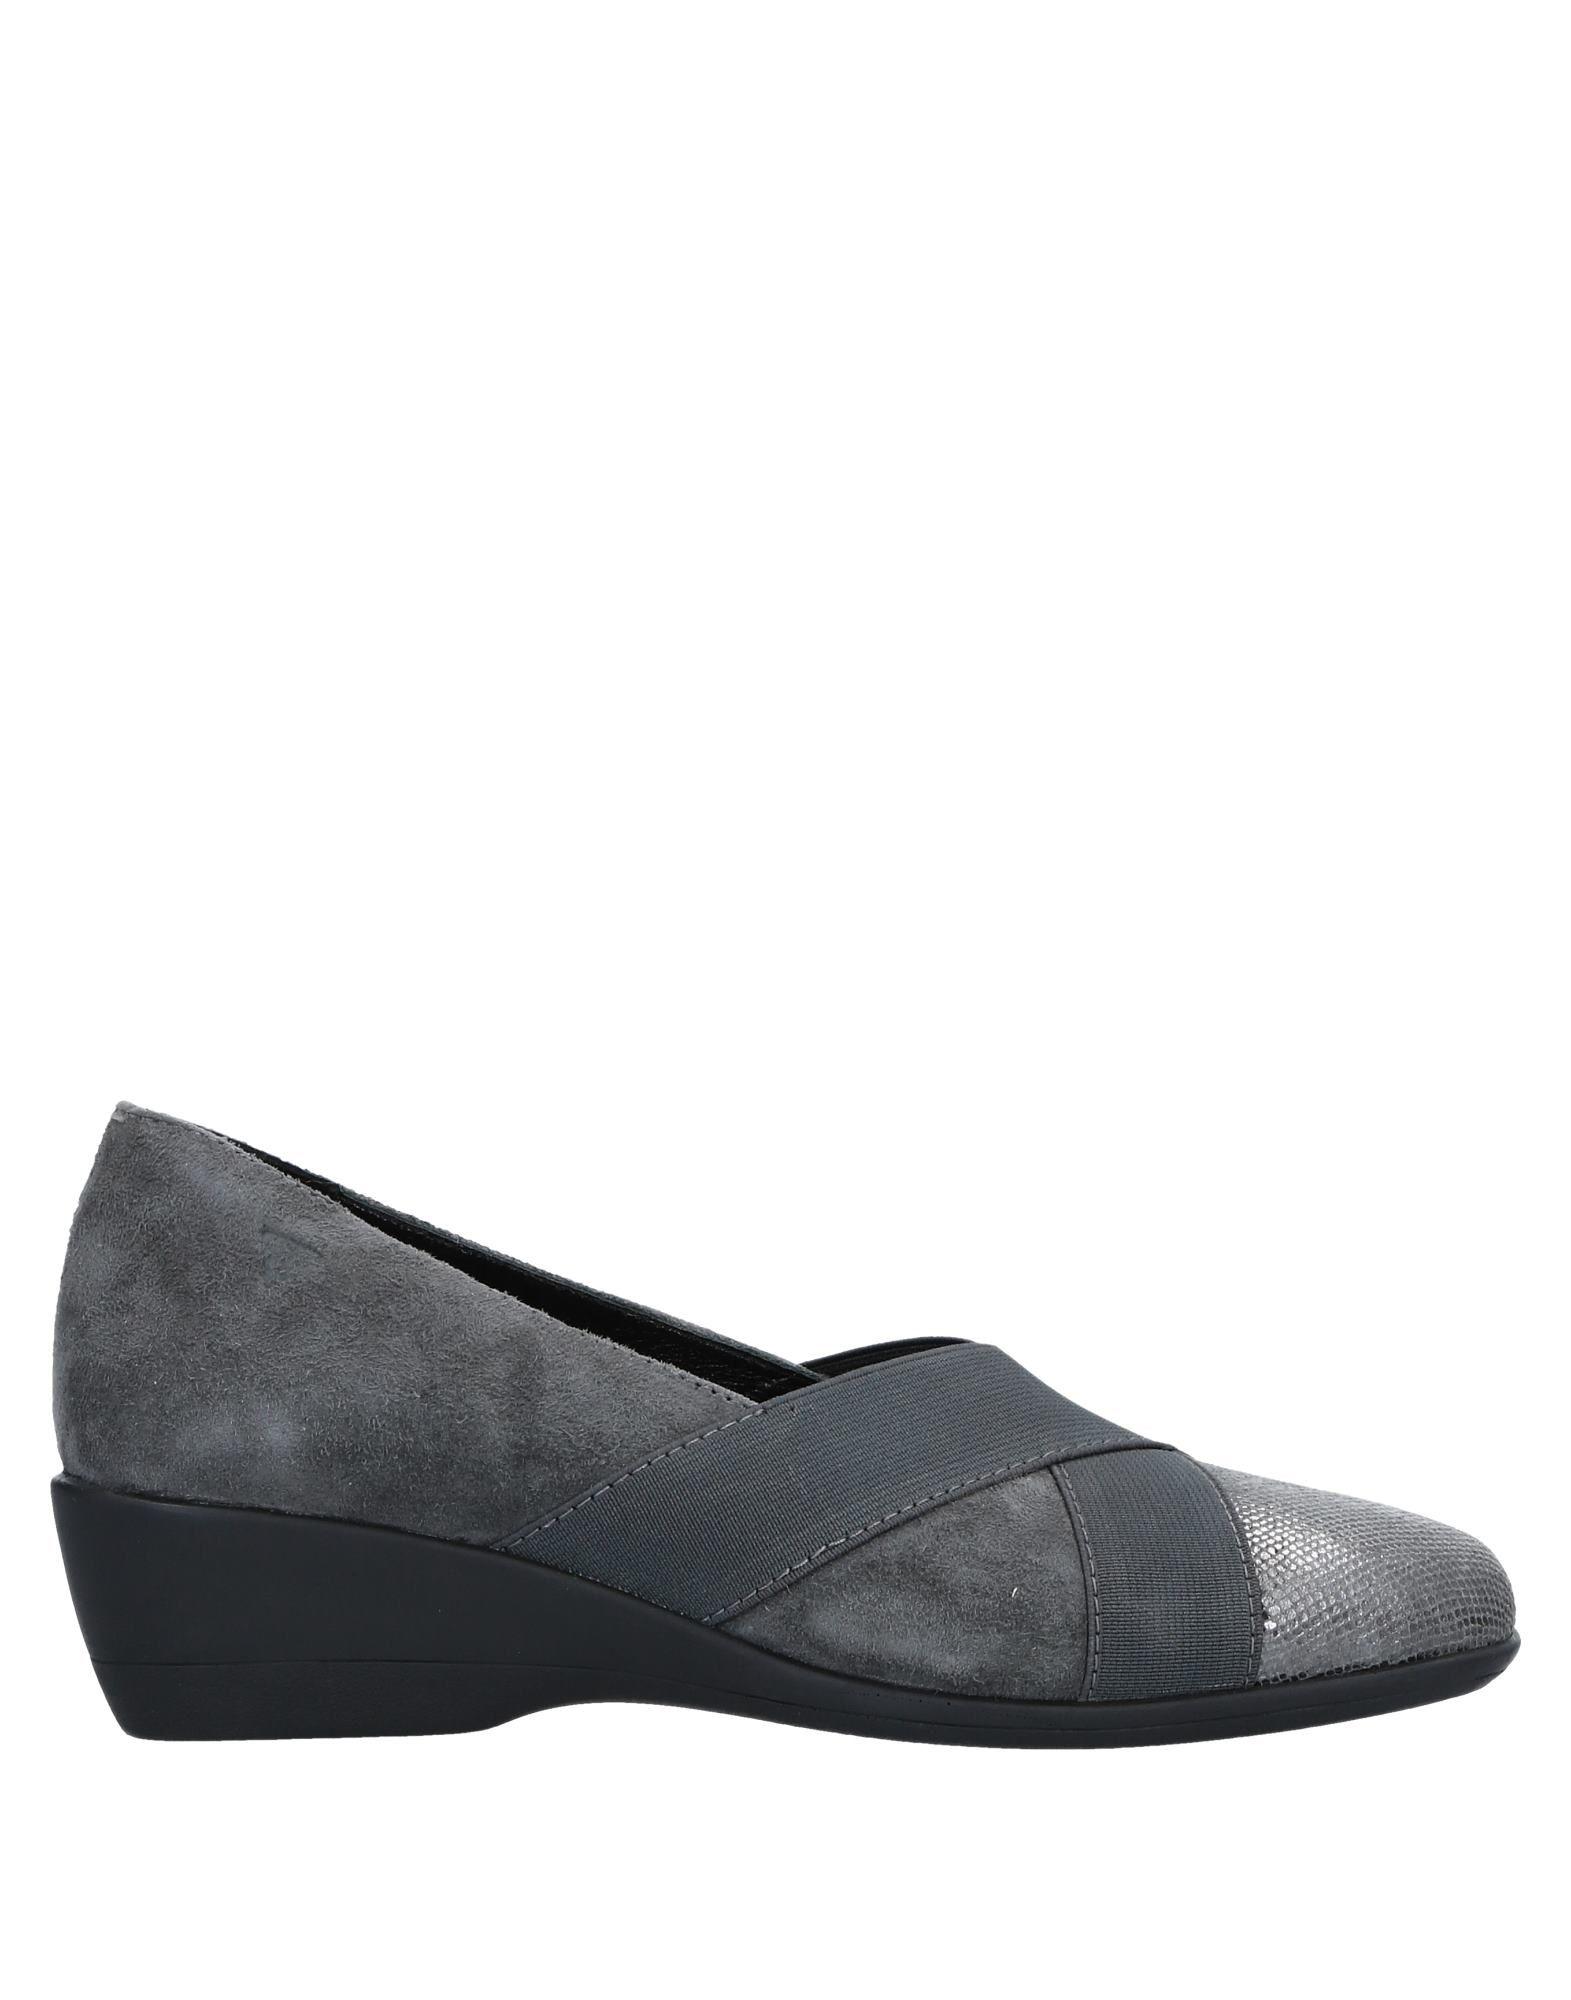 Mocassino Calpierre Donna e - 11551482HR Nuove offerte e Donna scarpe comode d428d5